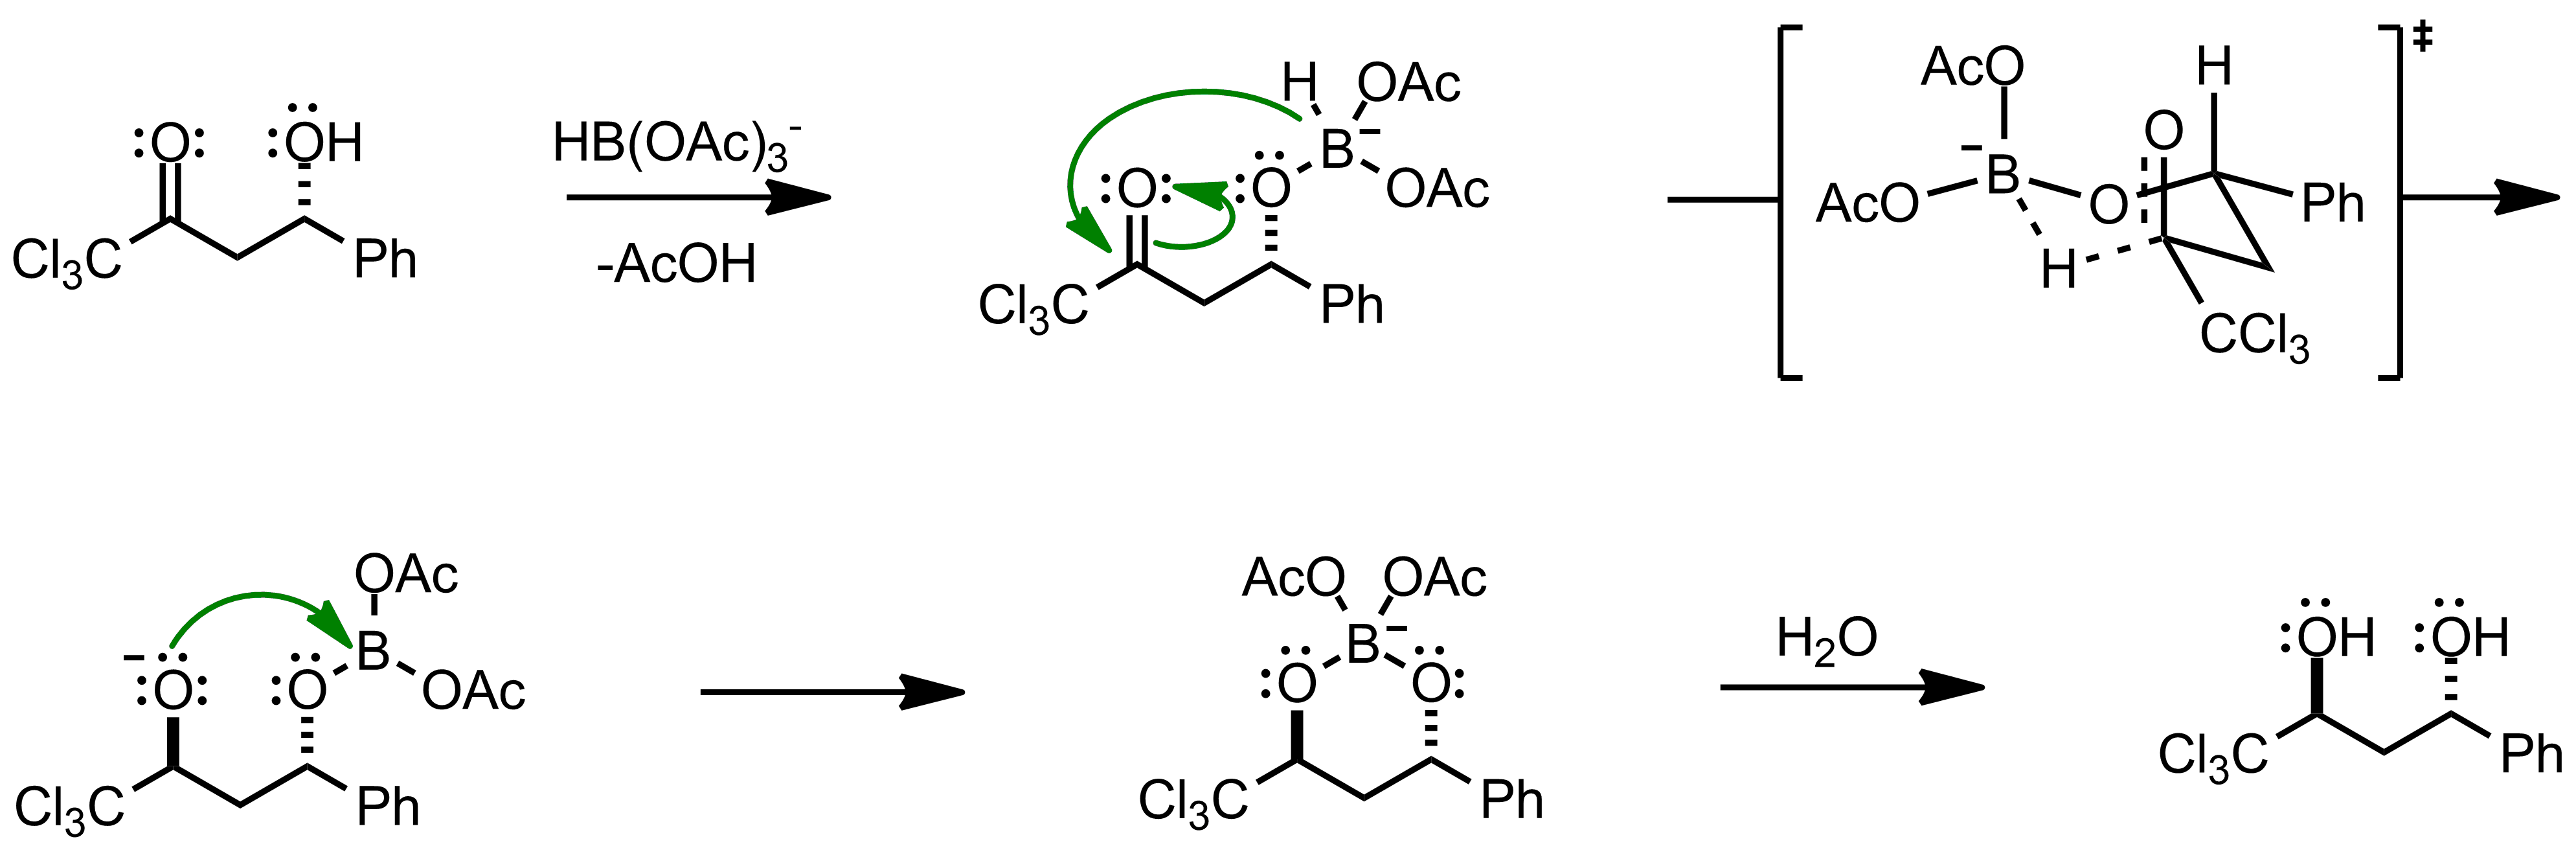 Mechanism of the Evans-Saksena Reduction